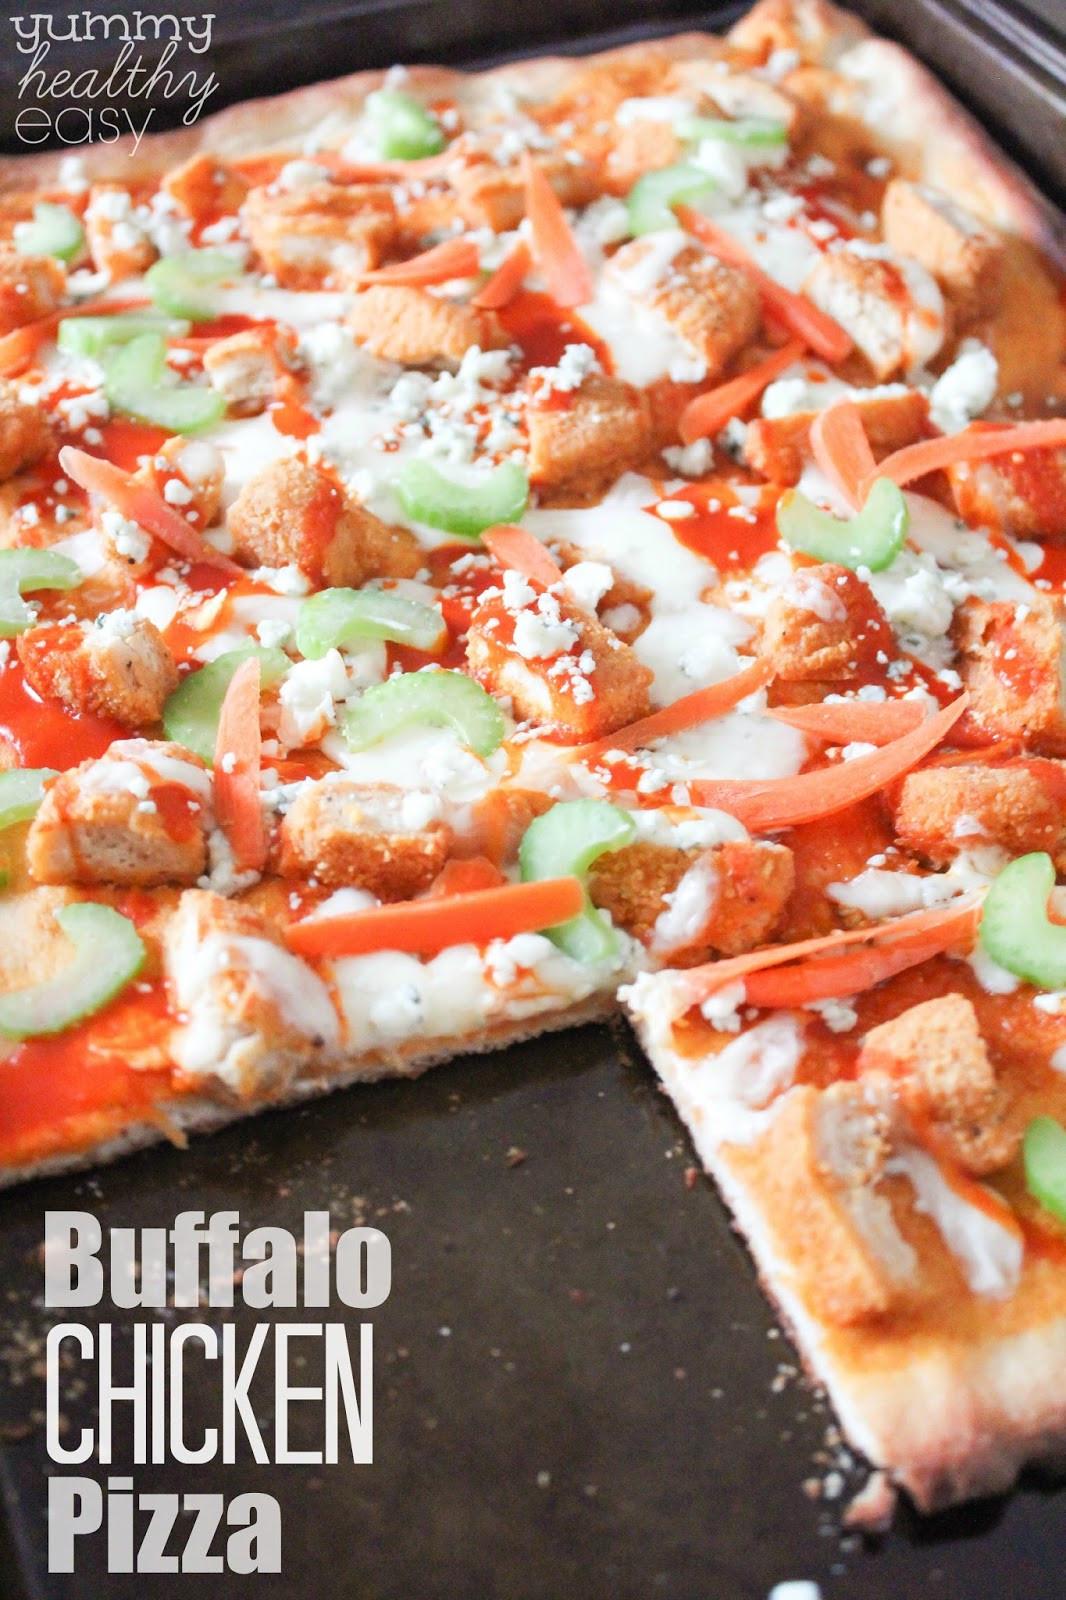 Healthy Buffalo Chicken Pizza  Easy Buffalo Chicken Pizza Yummy Healthy Easy